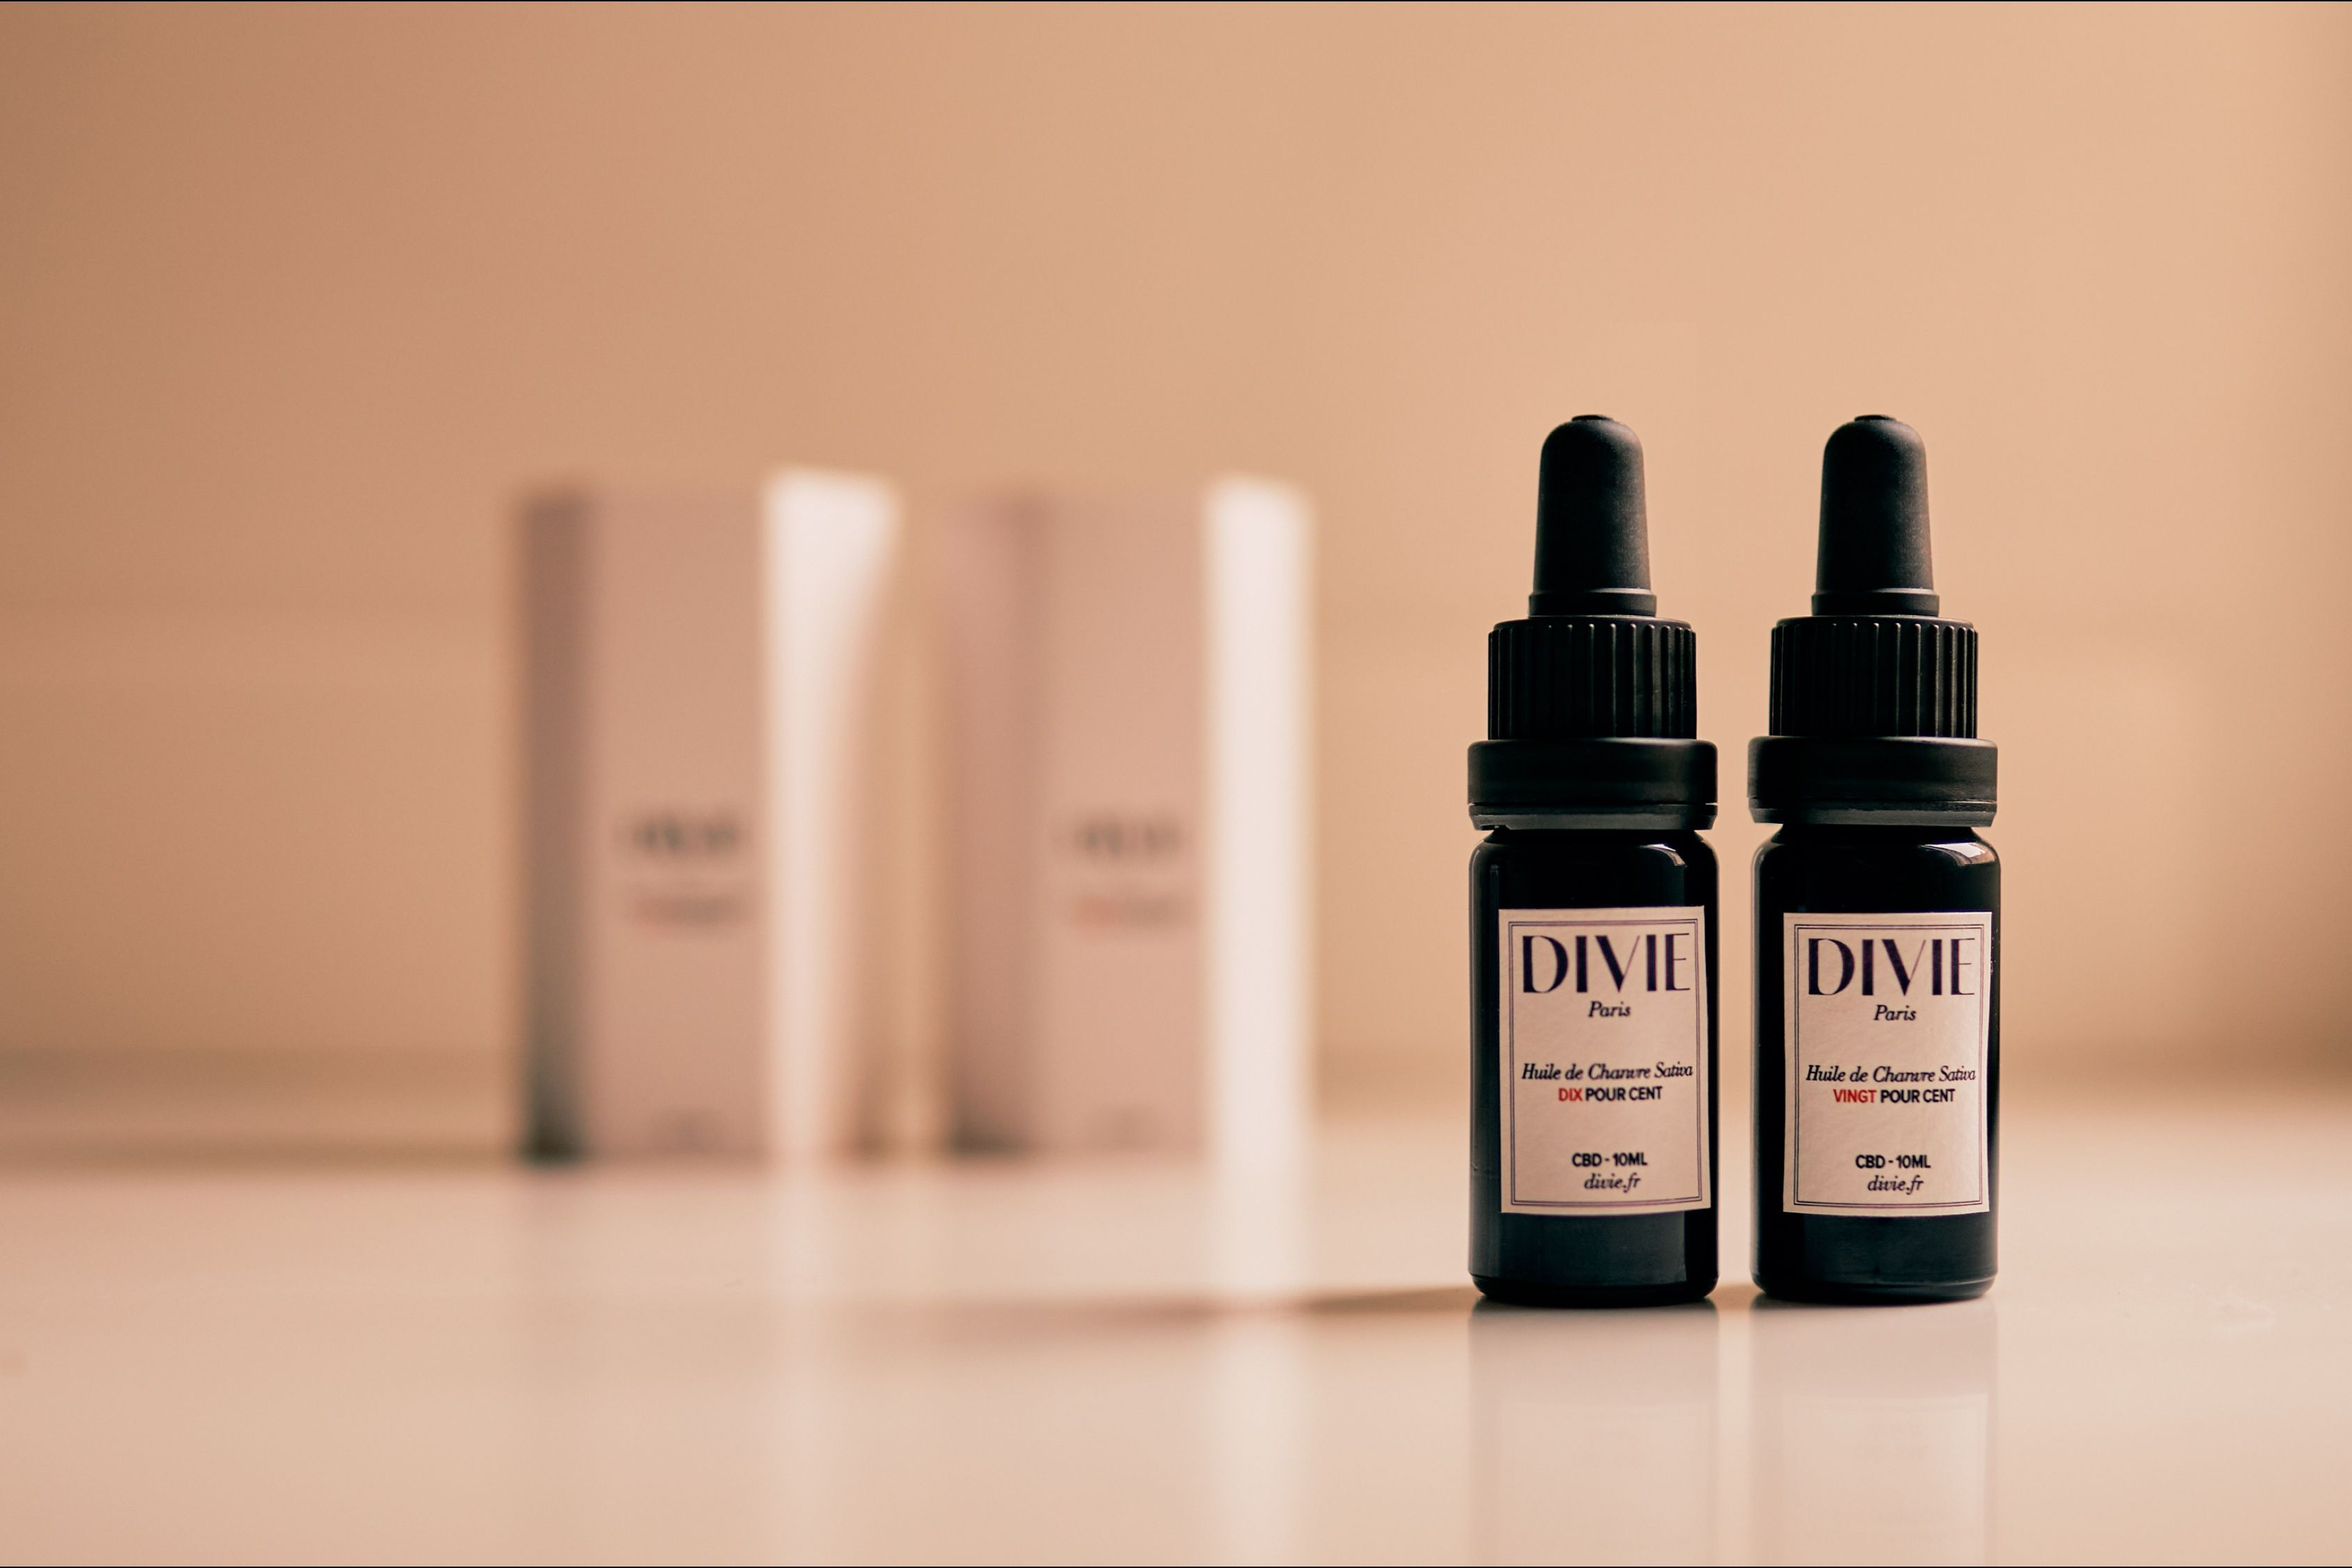 DIVIE-2